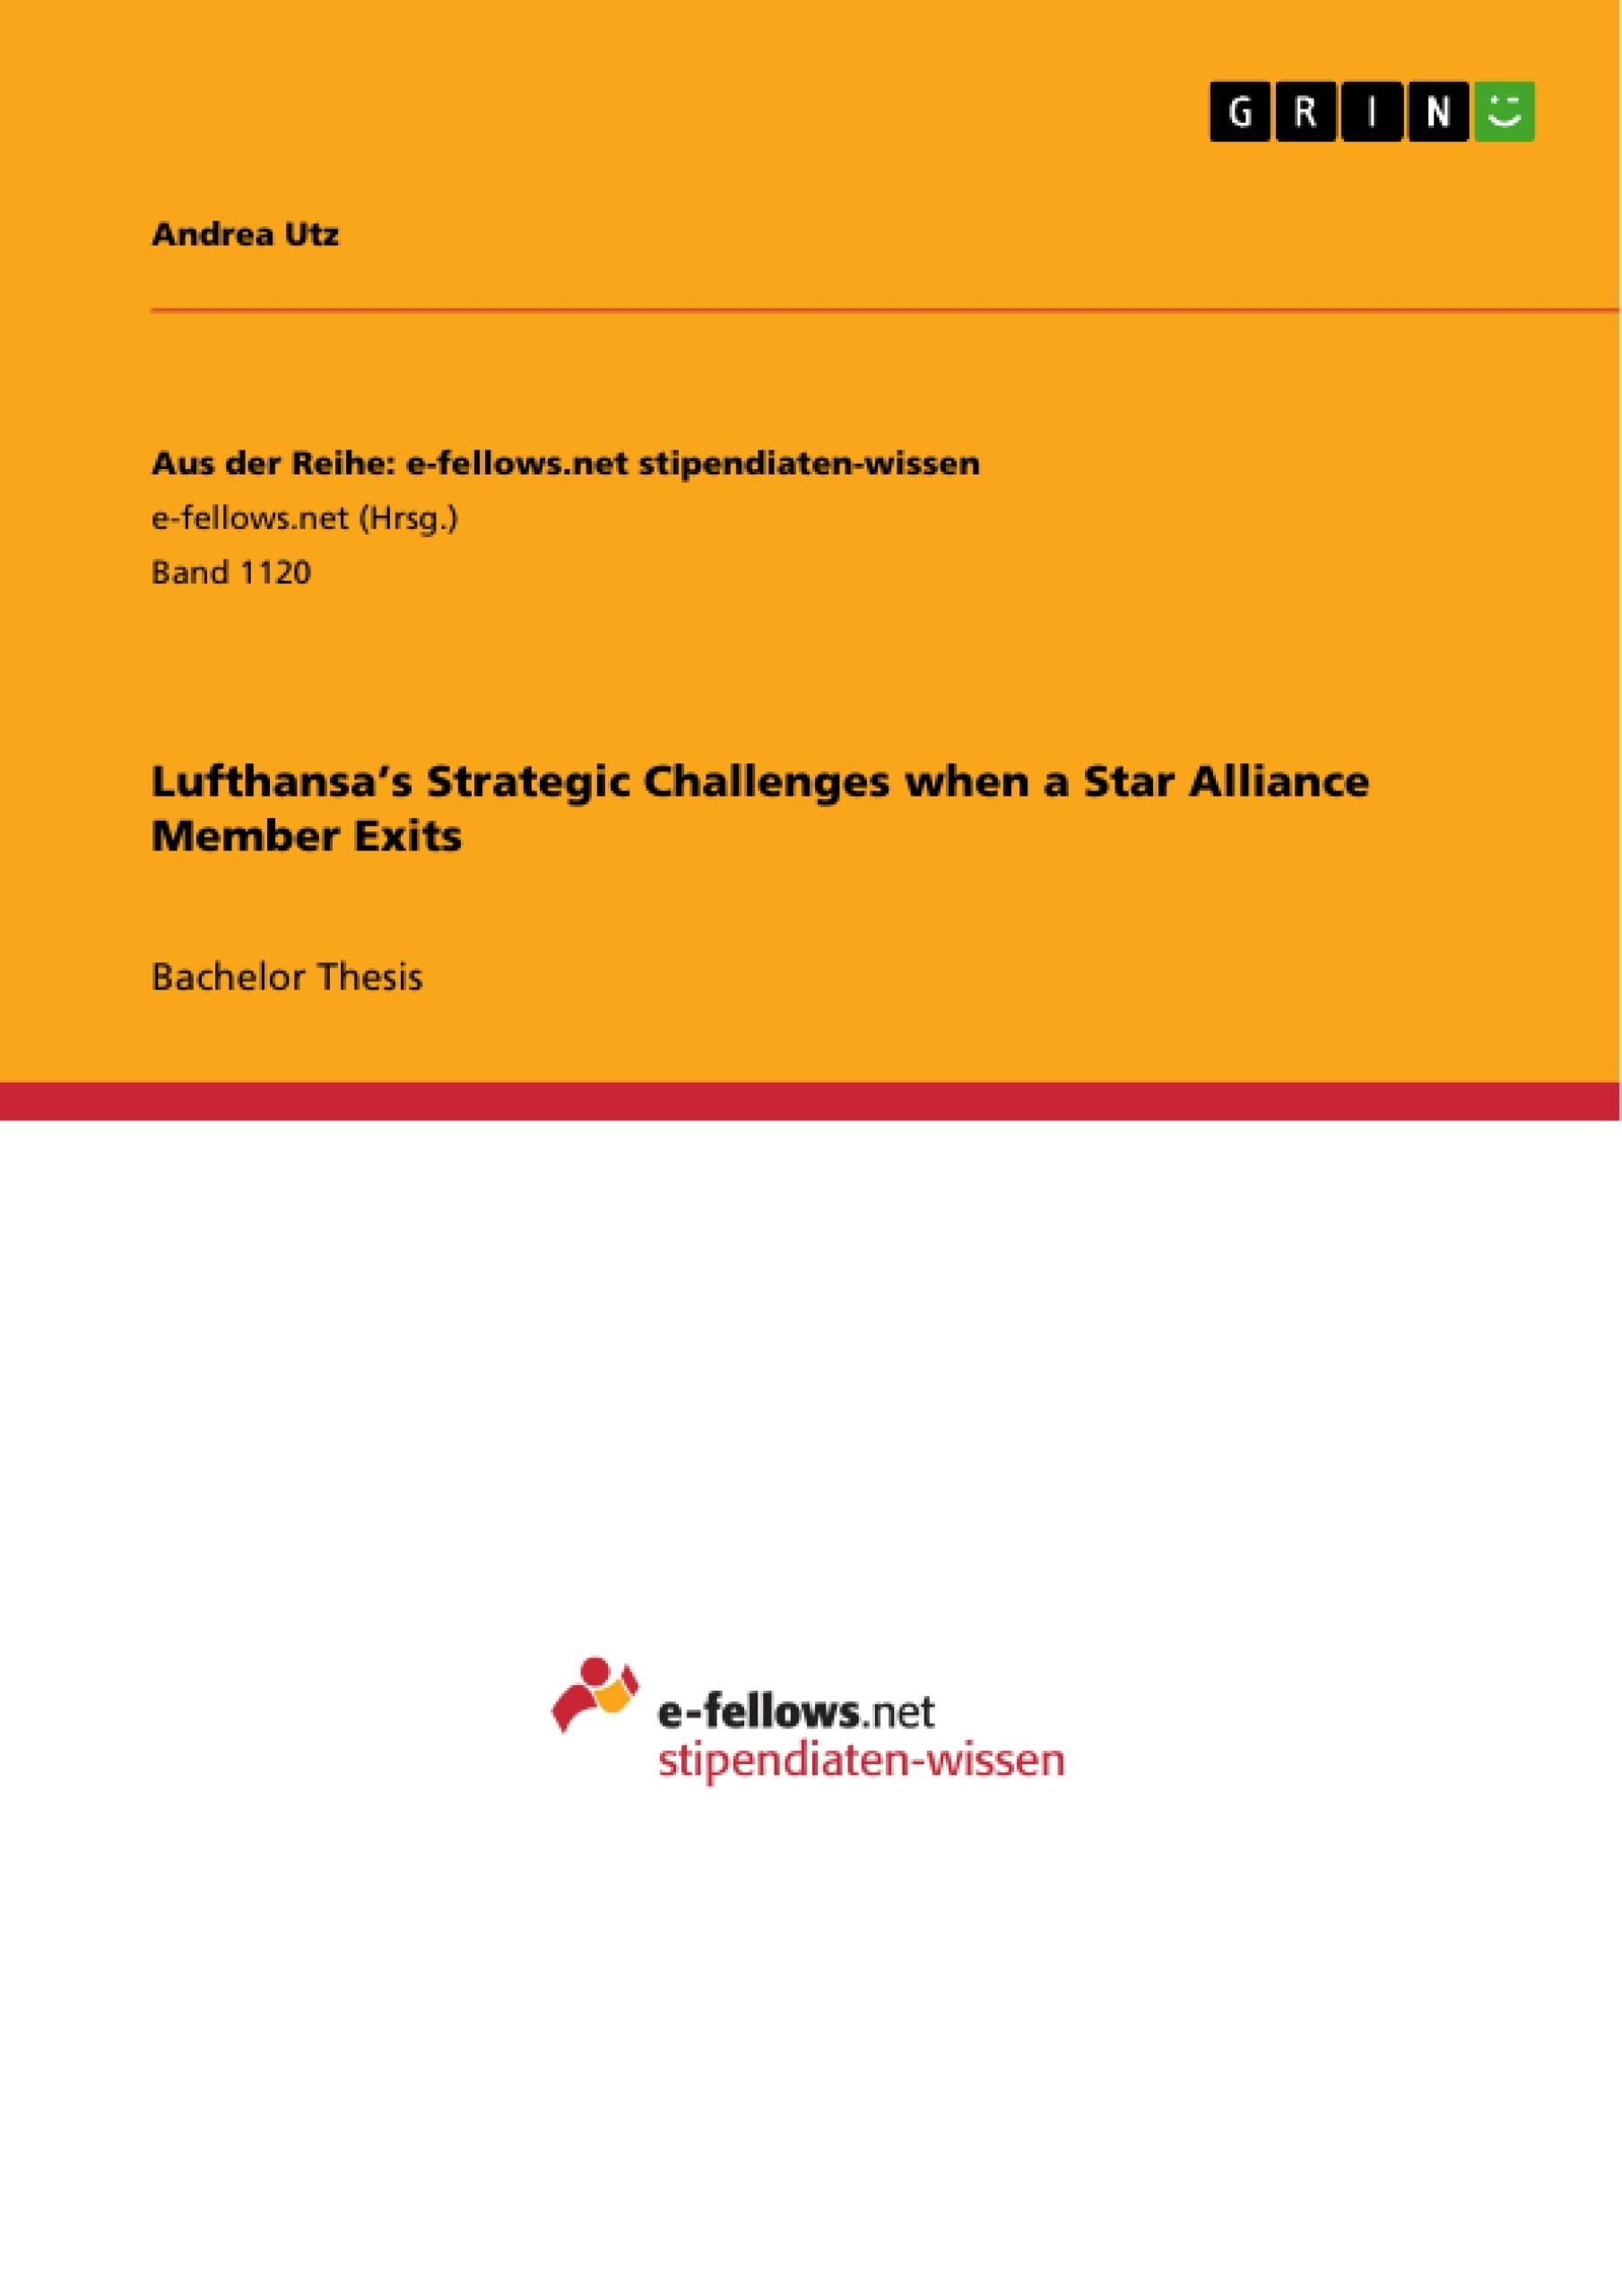 GRIN - Lufthansa's Strategic Challenges when a Star Alliance Member Exits